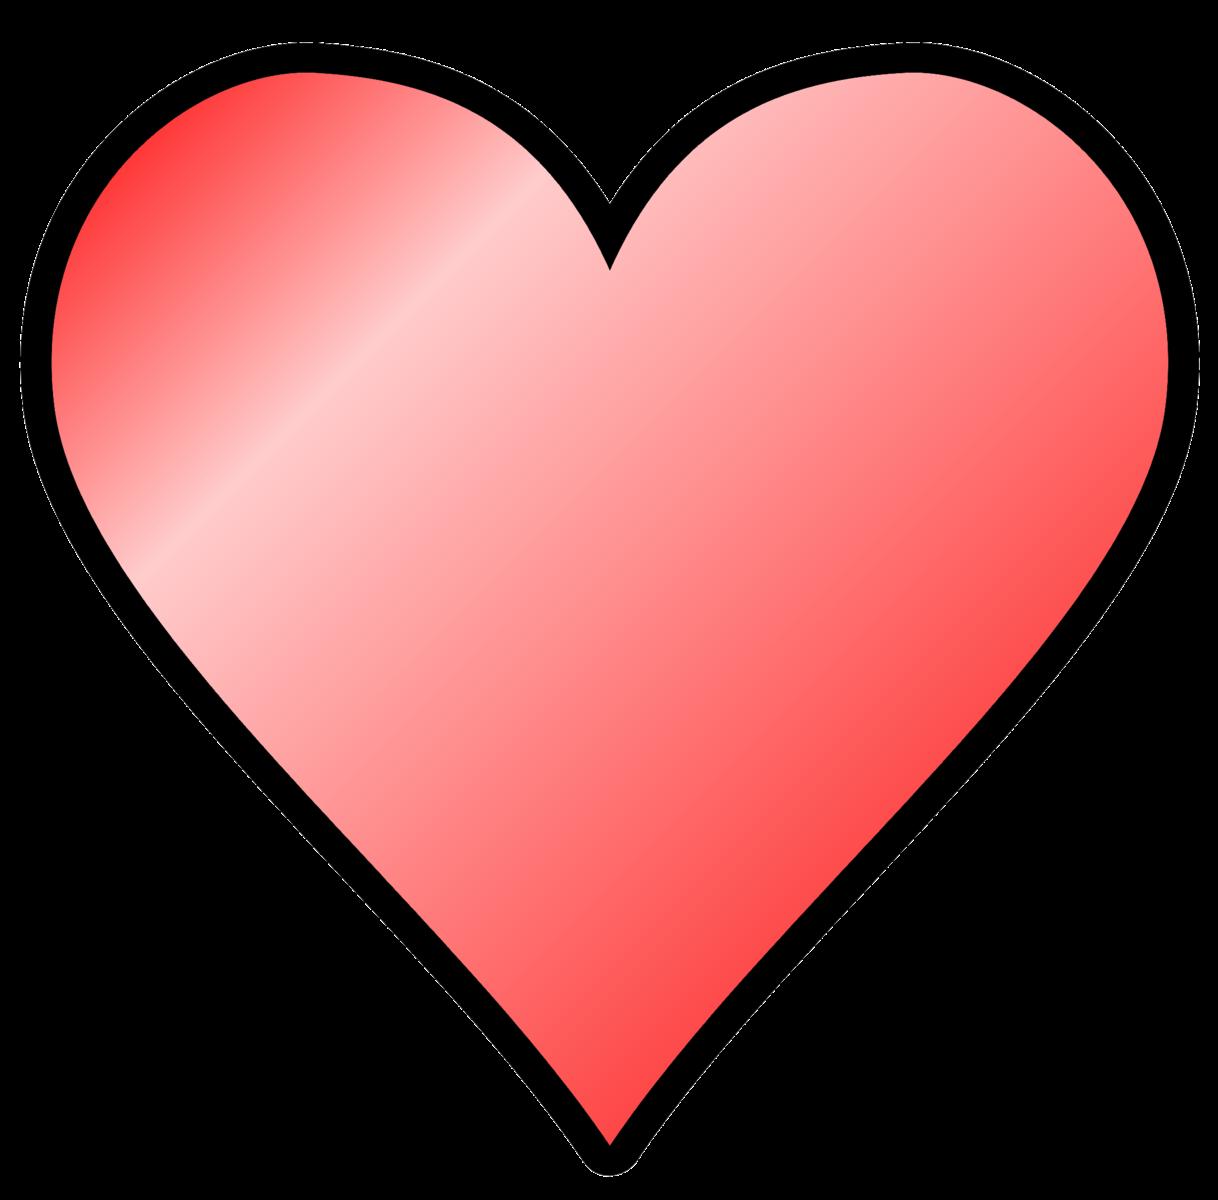 Картинки обычное сердце